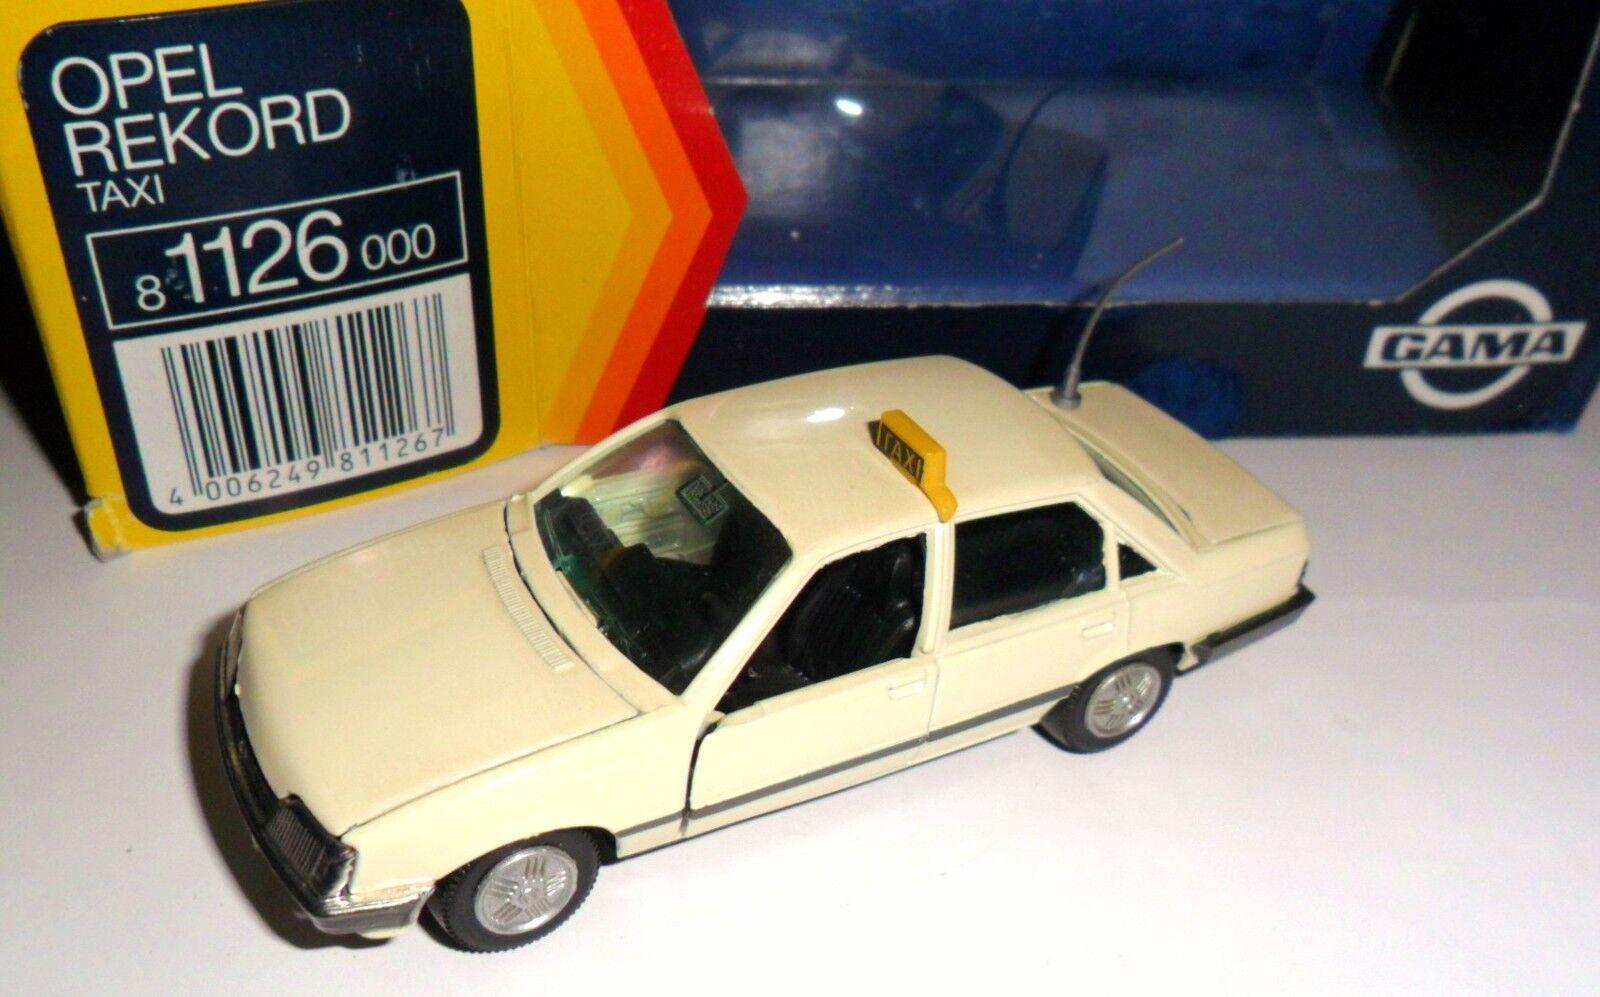 Opel Rekord E (E2)  TAXI TAXI TAXI  taxa taxis (Germany), GAMA in 1 43 ovp ALT  55adcb